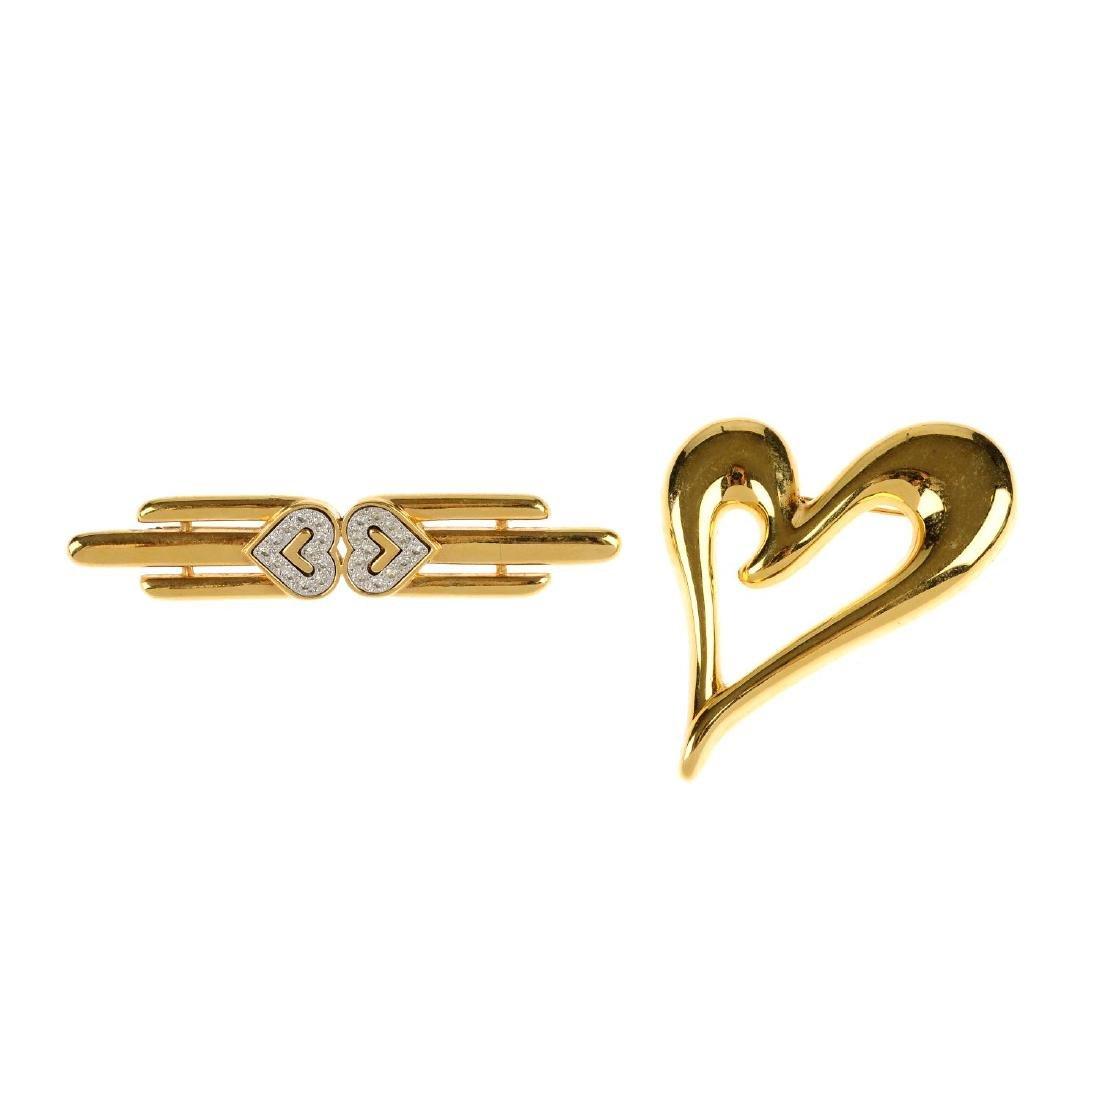 MONET - twenty items of jewellery and one single